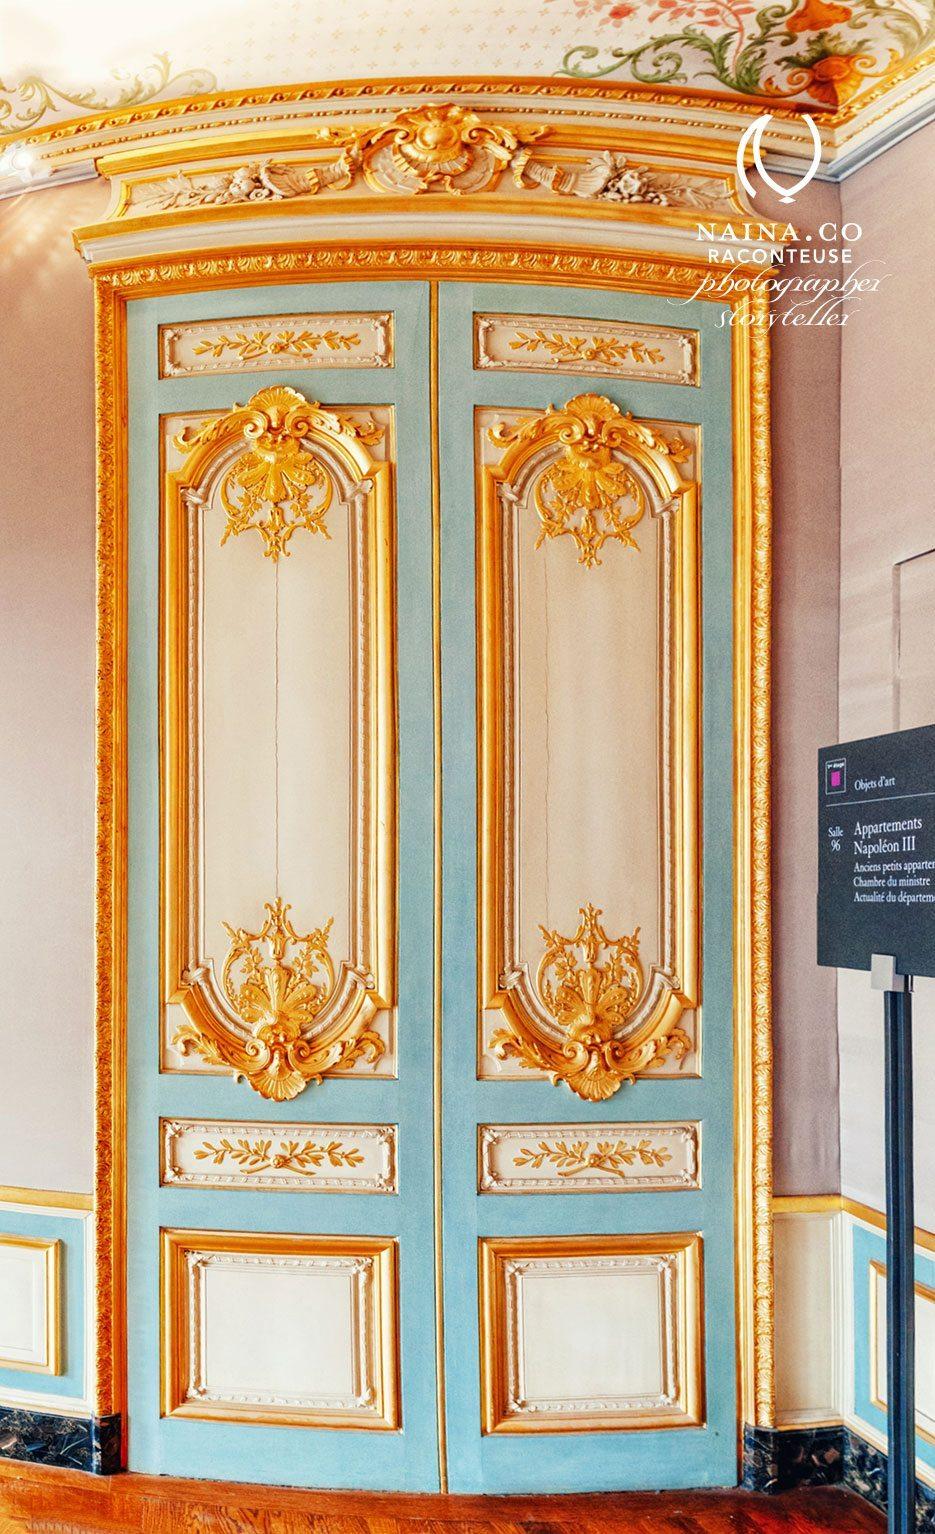 Naina.co-Louvre-Museum-Paris-France-EyesForParis-Raconteuse-Storyteller-Photographer-Blogger-Luxury-Lifestyle-073